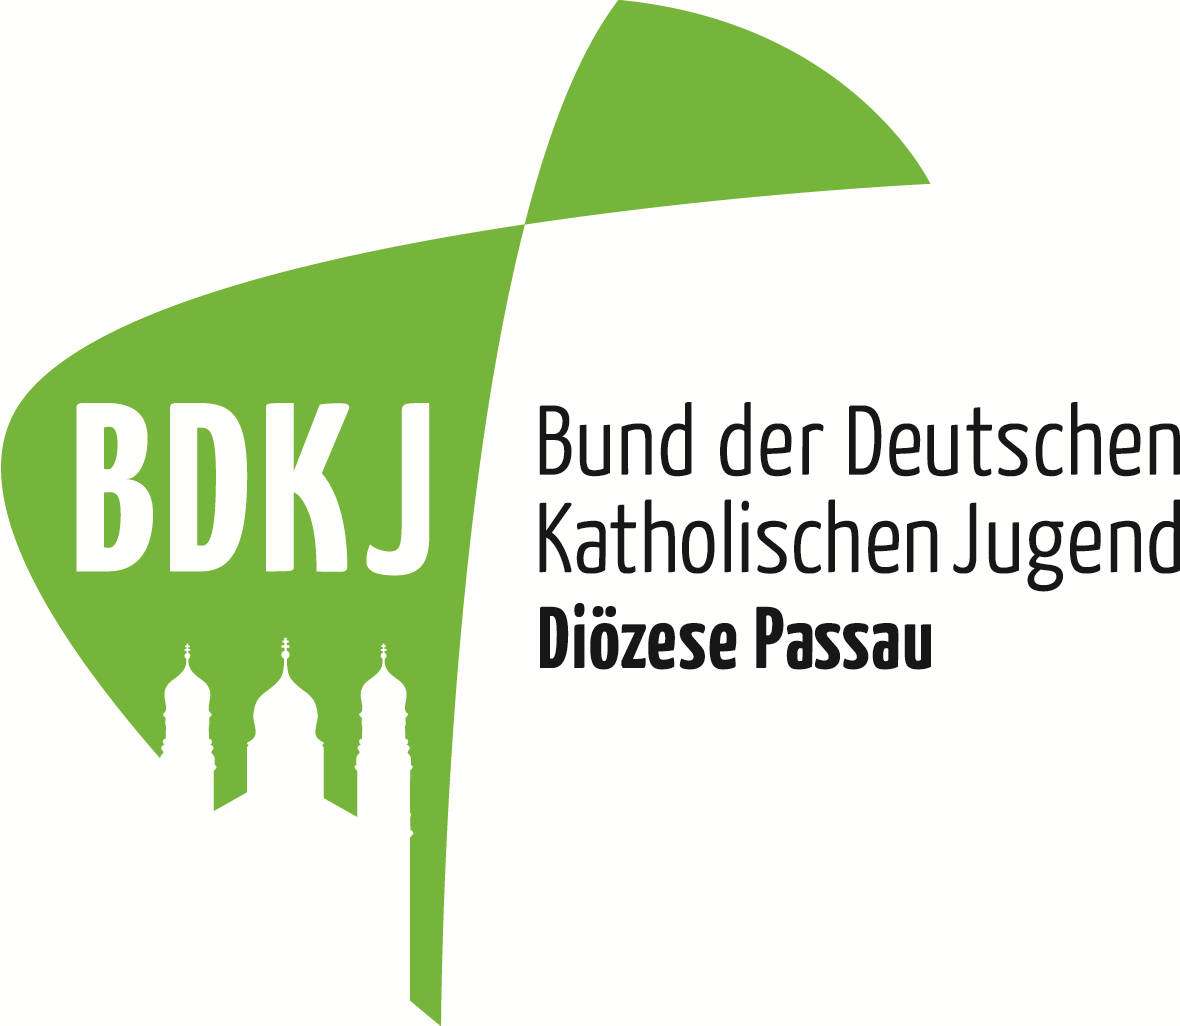 BDKJ Passau 4c